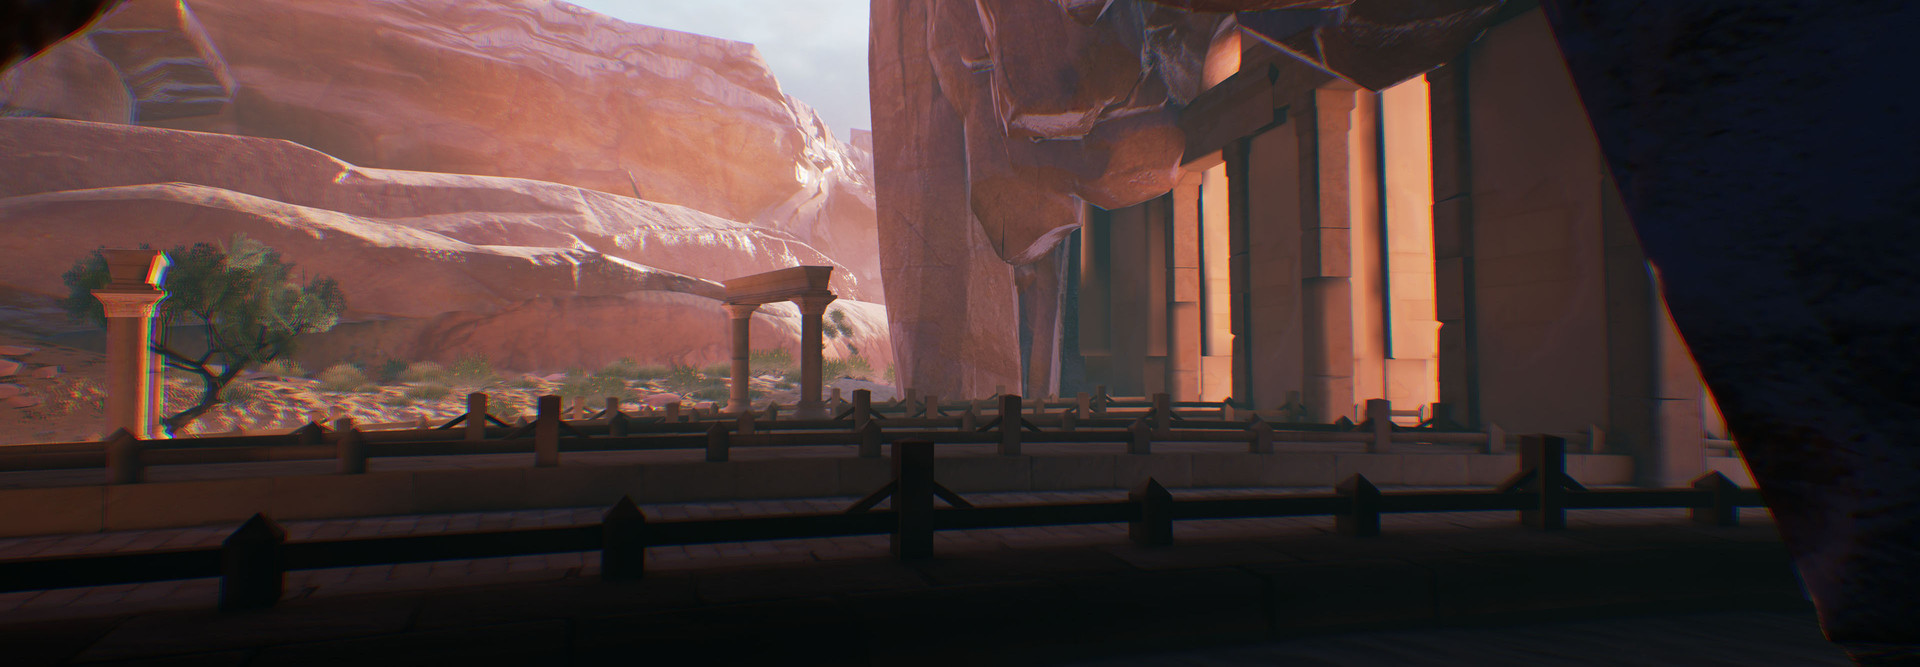 Florian thomasset desert temple 15